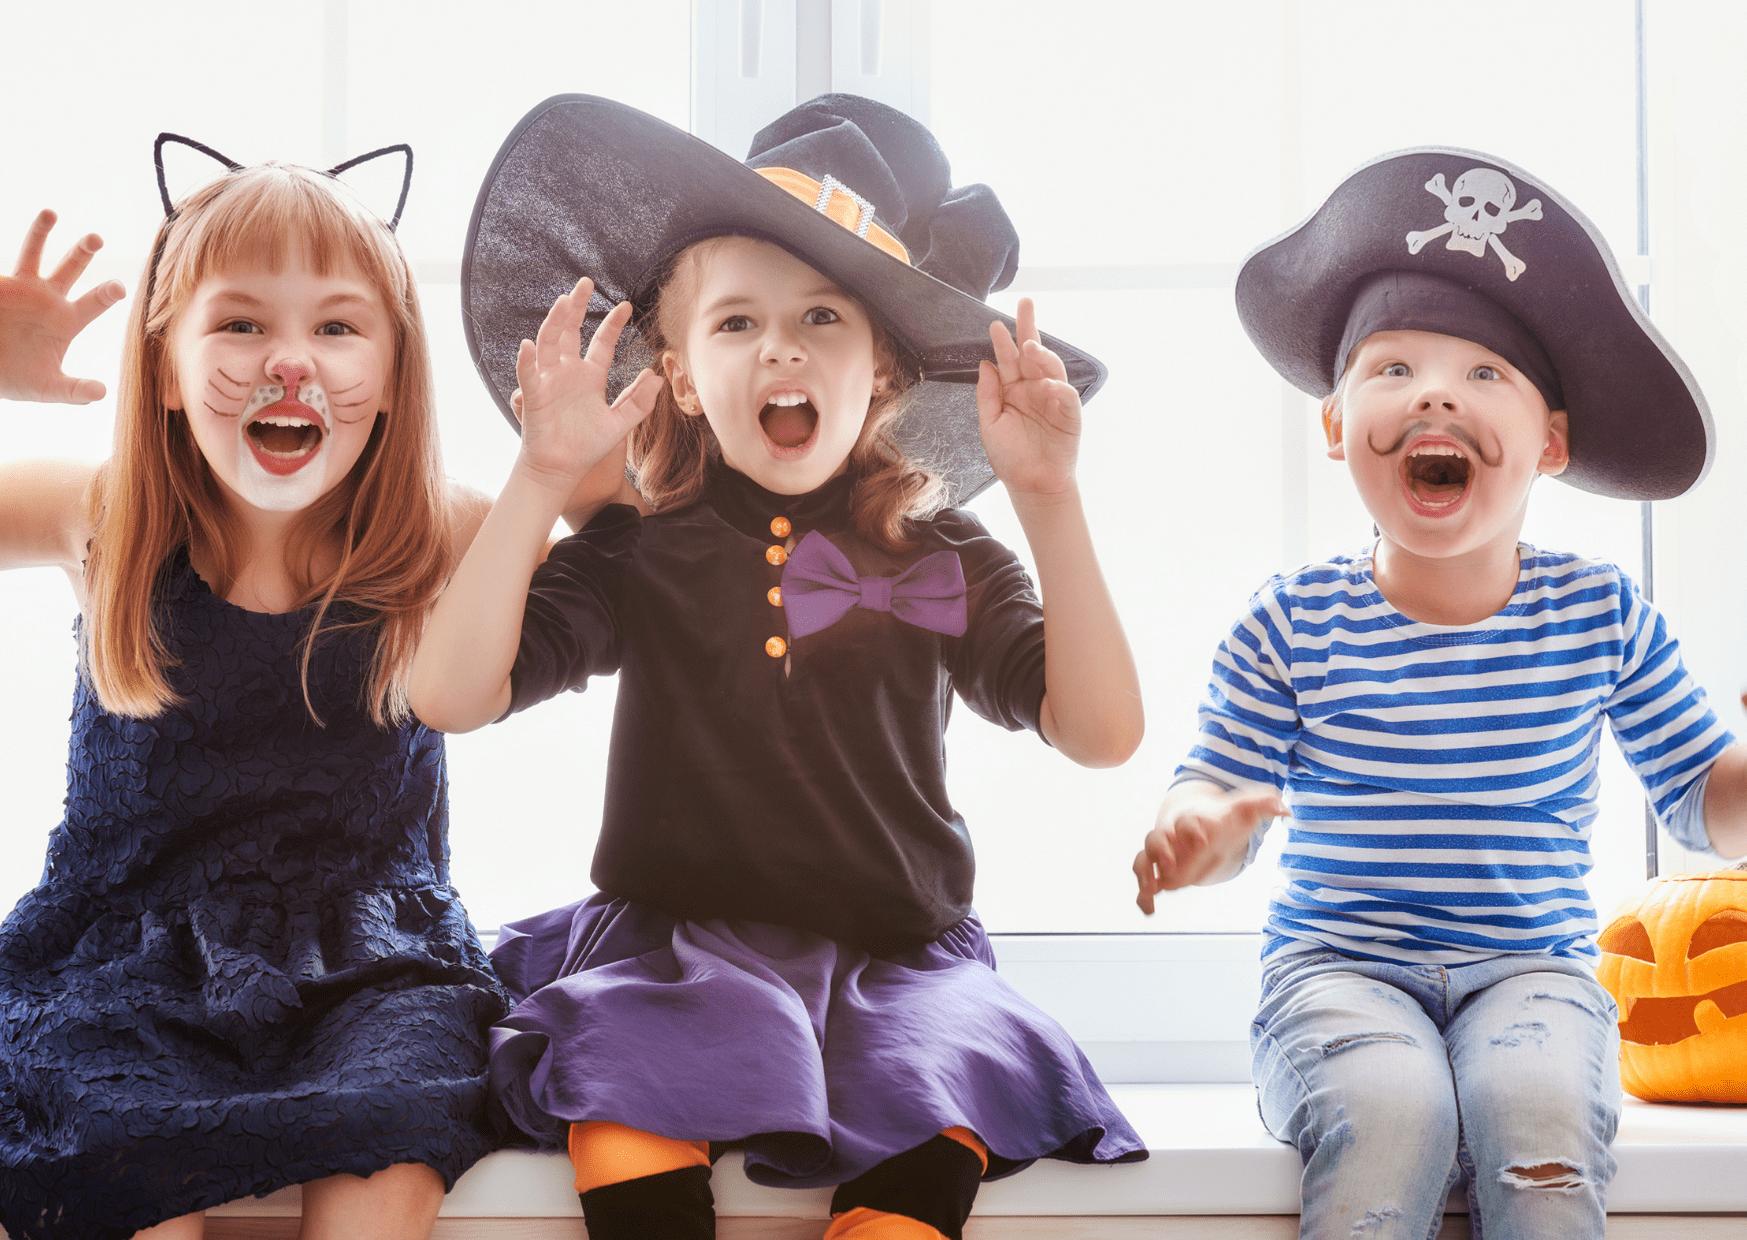 celebrate halloween this year